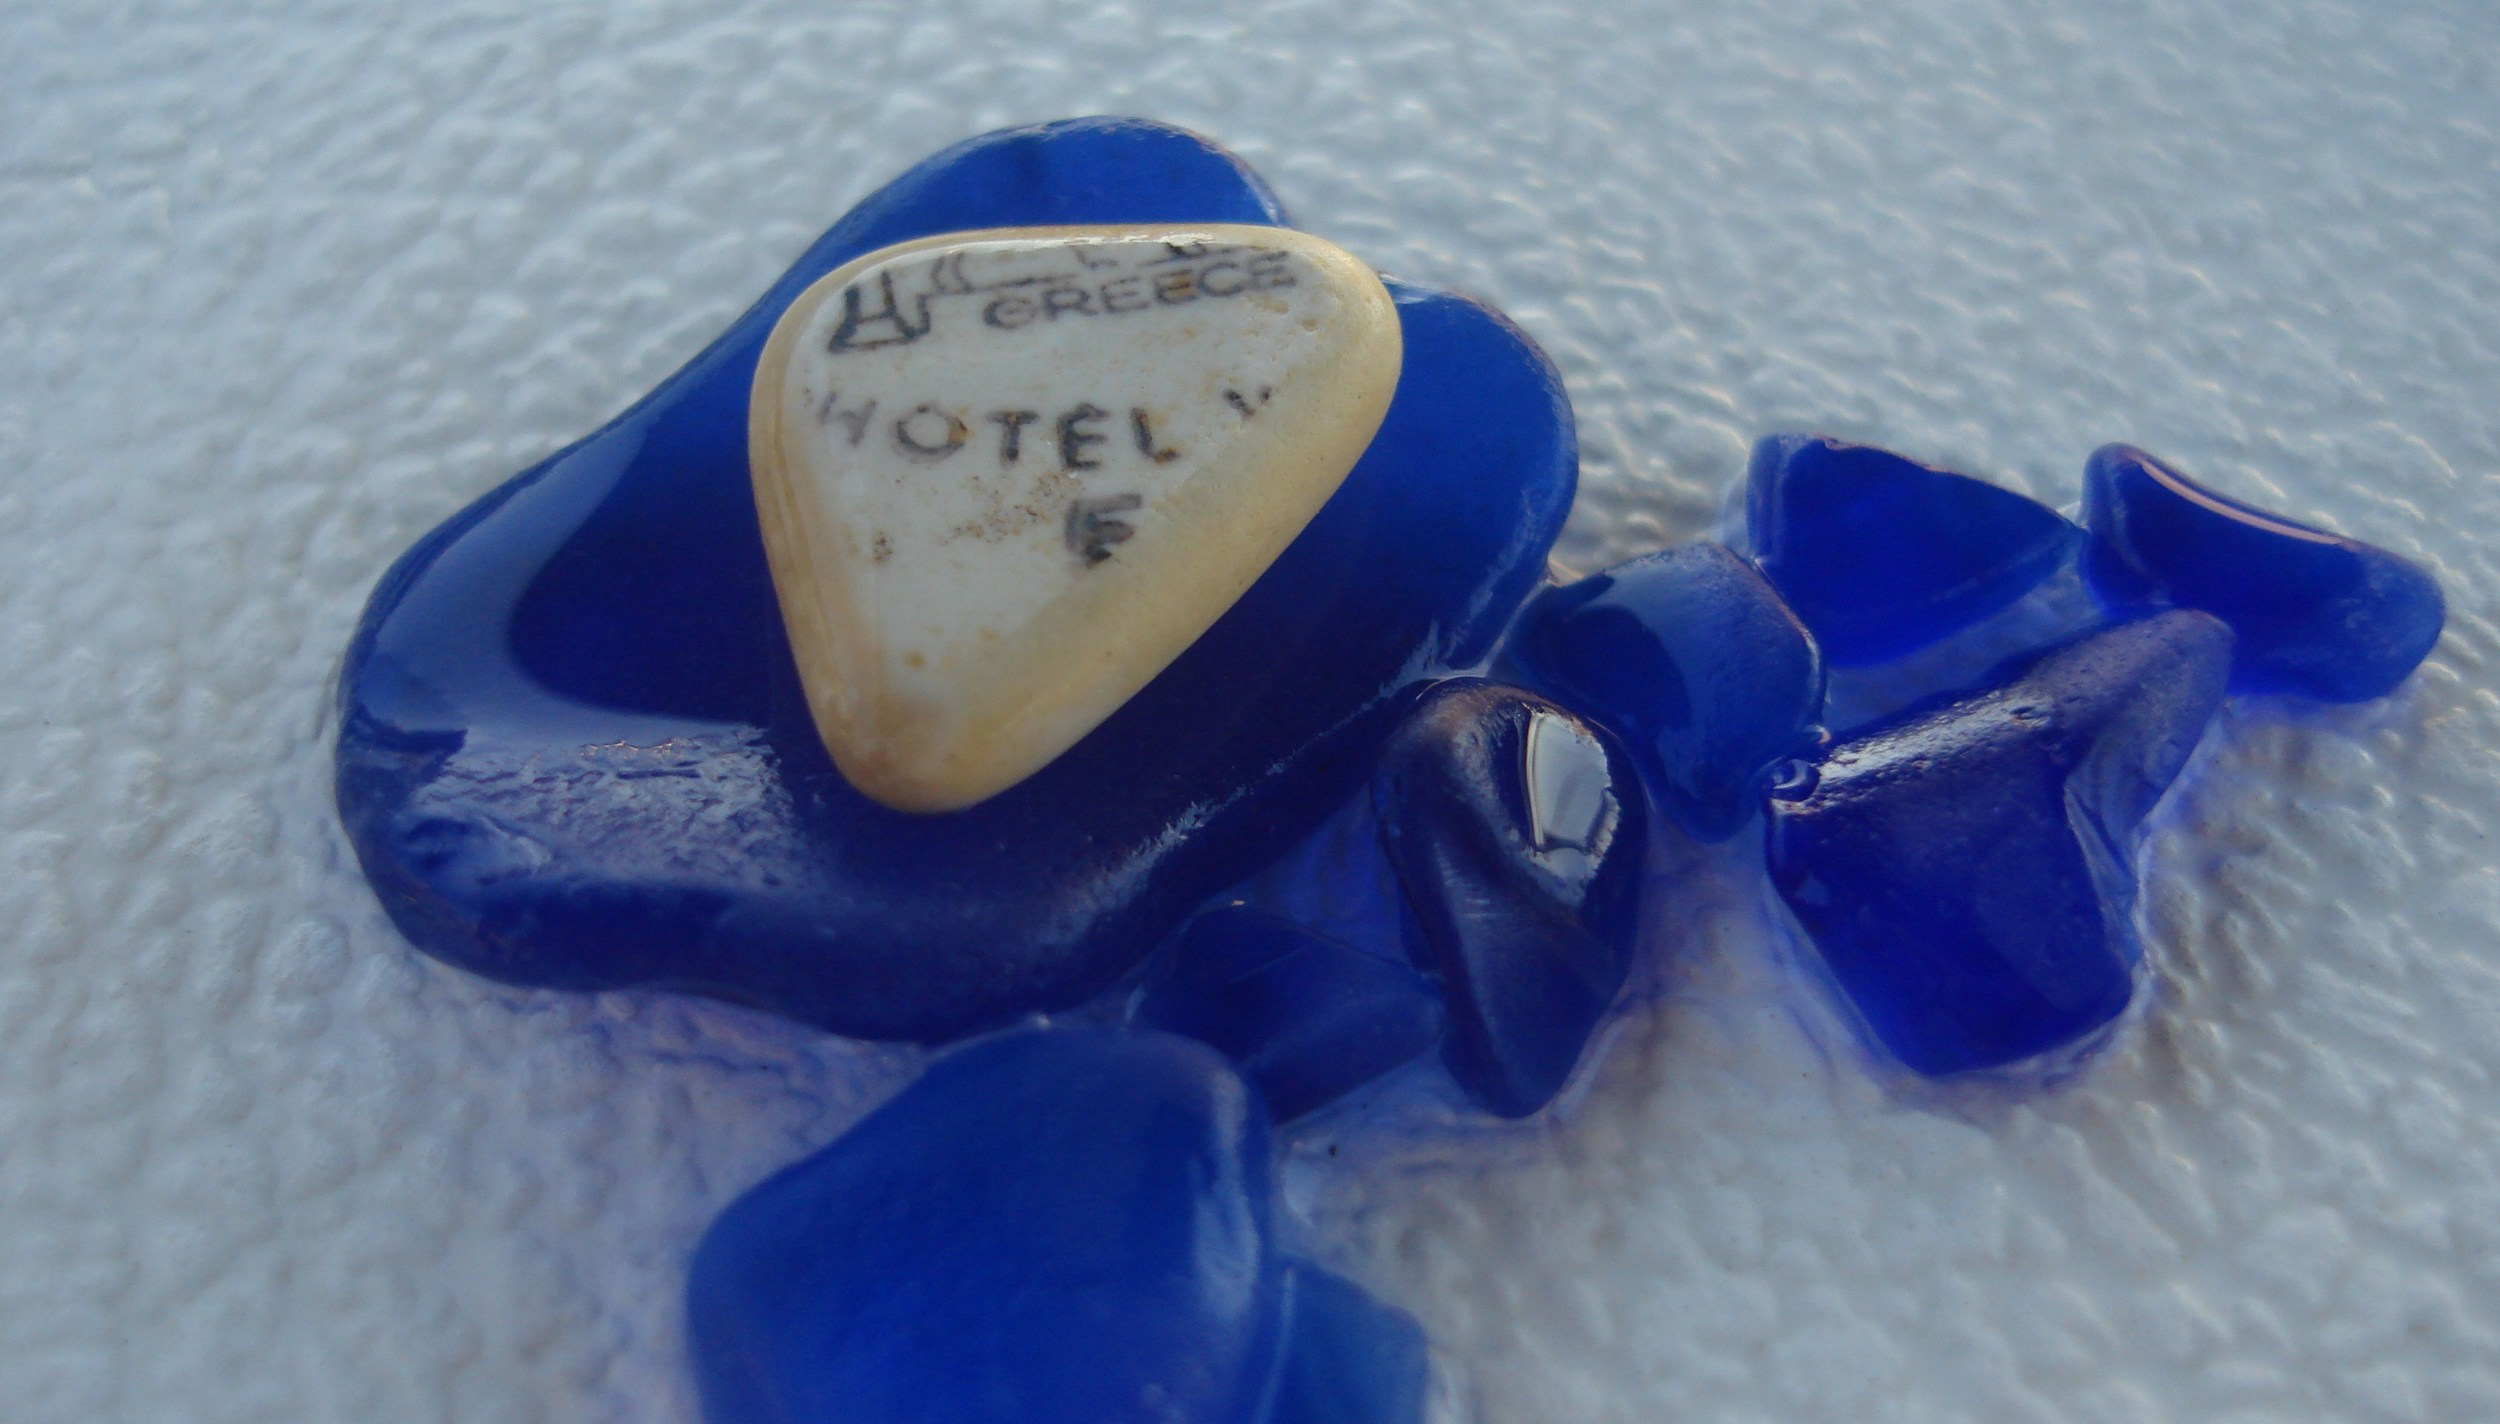 Cobalt sea glass with an apropos saying on the sea glass tile.